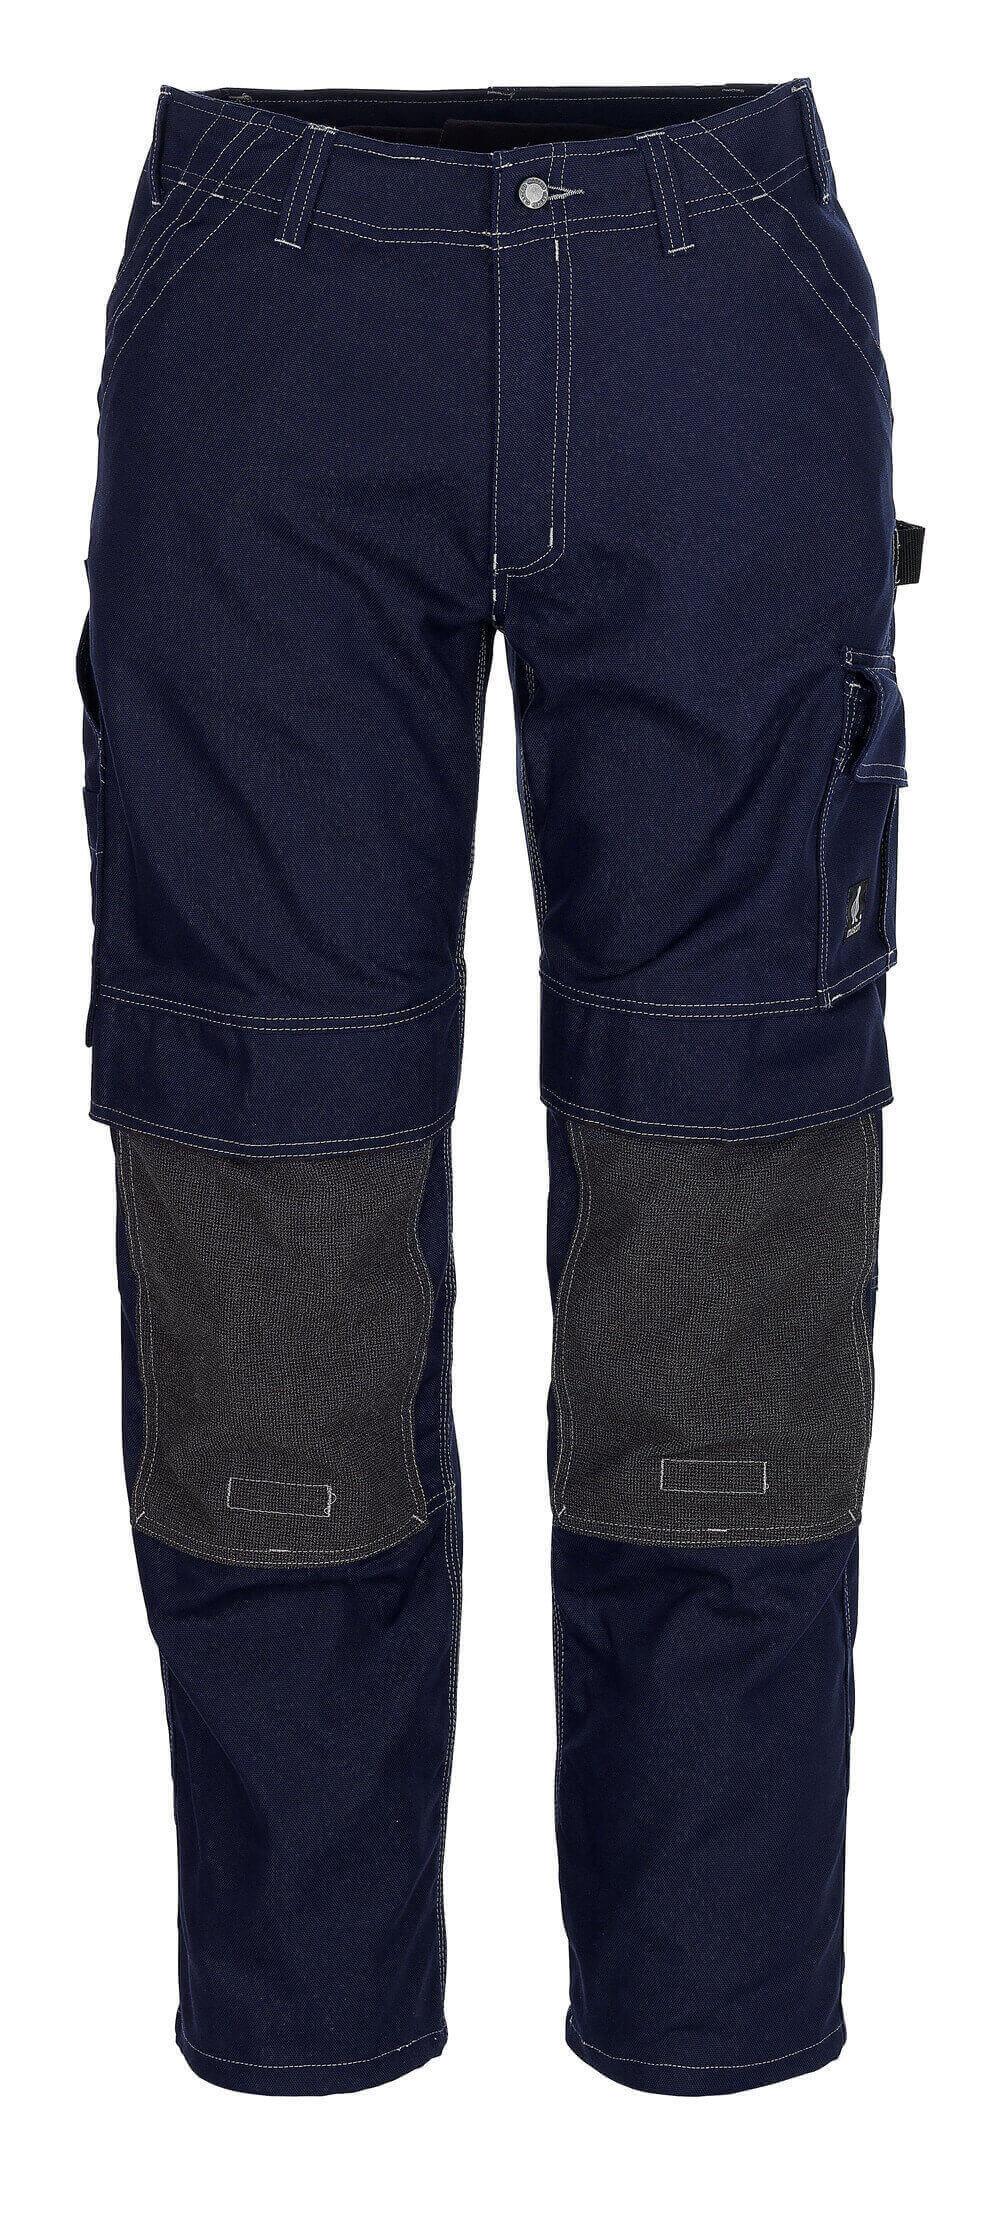 05079-010-01 Pantaloni con tasche porta-ginocchiere - blu navy